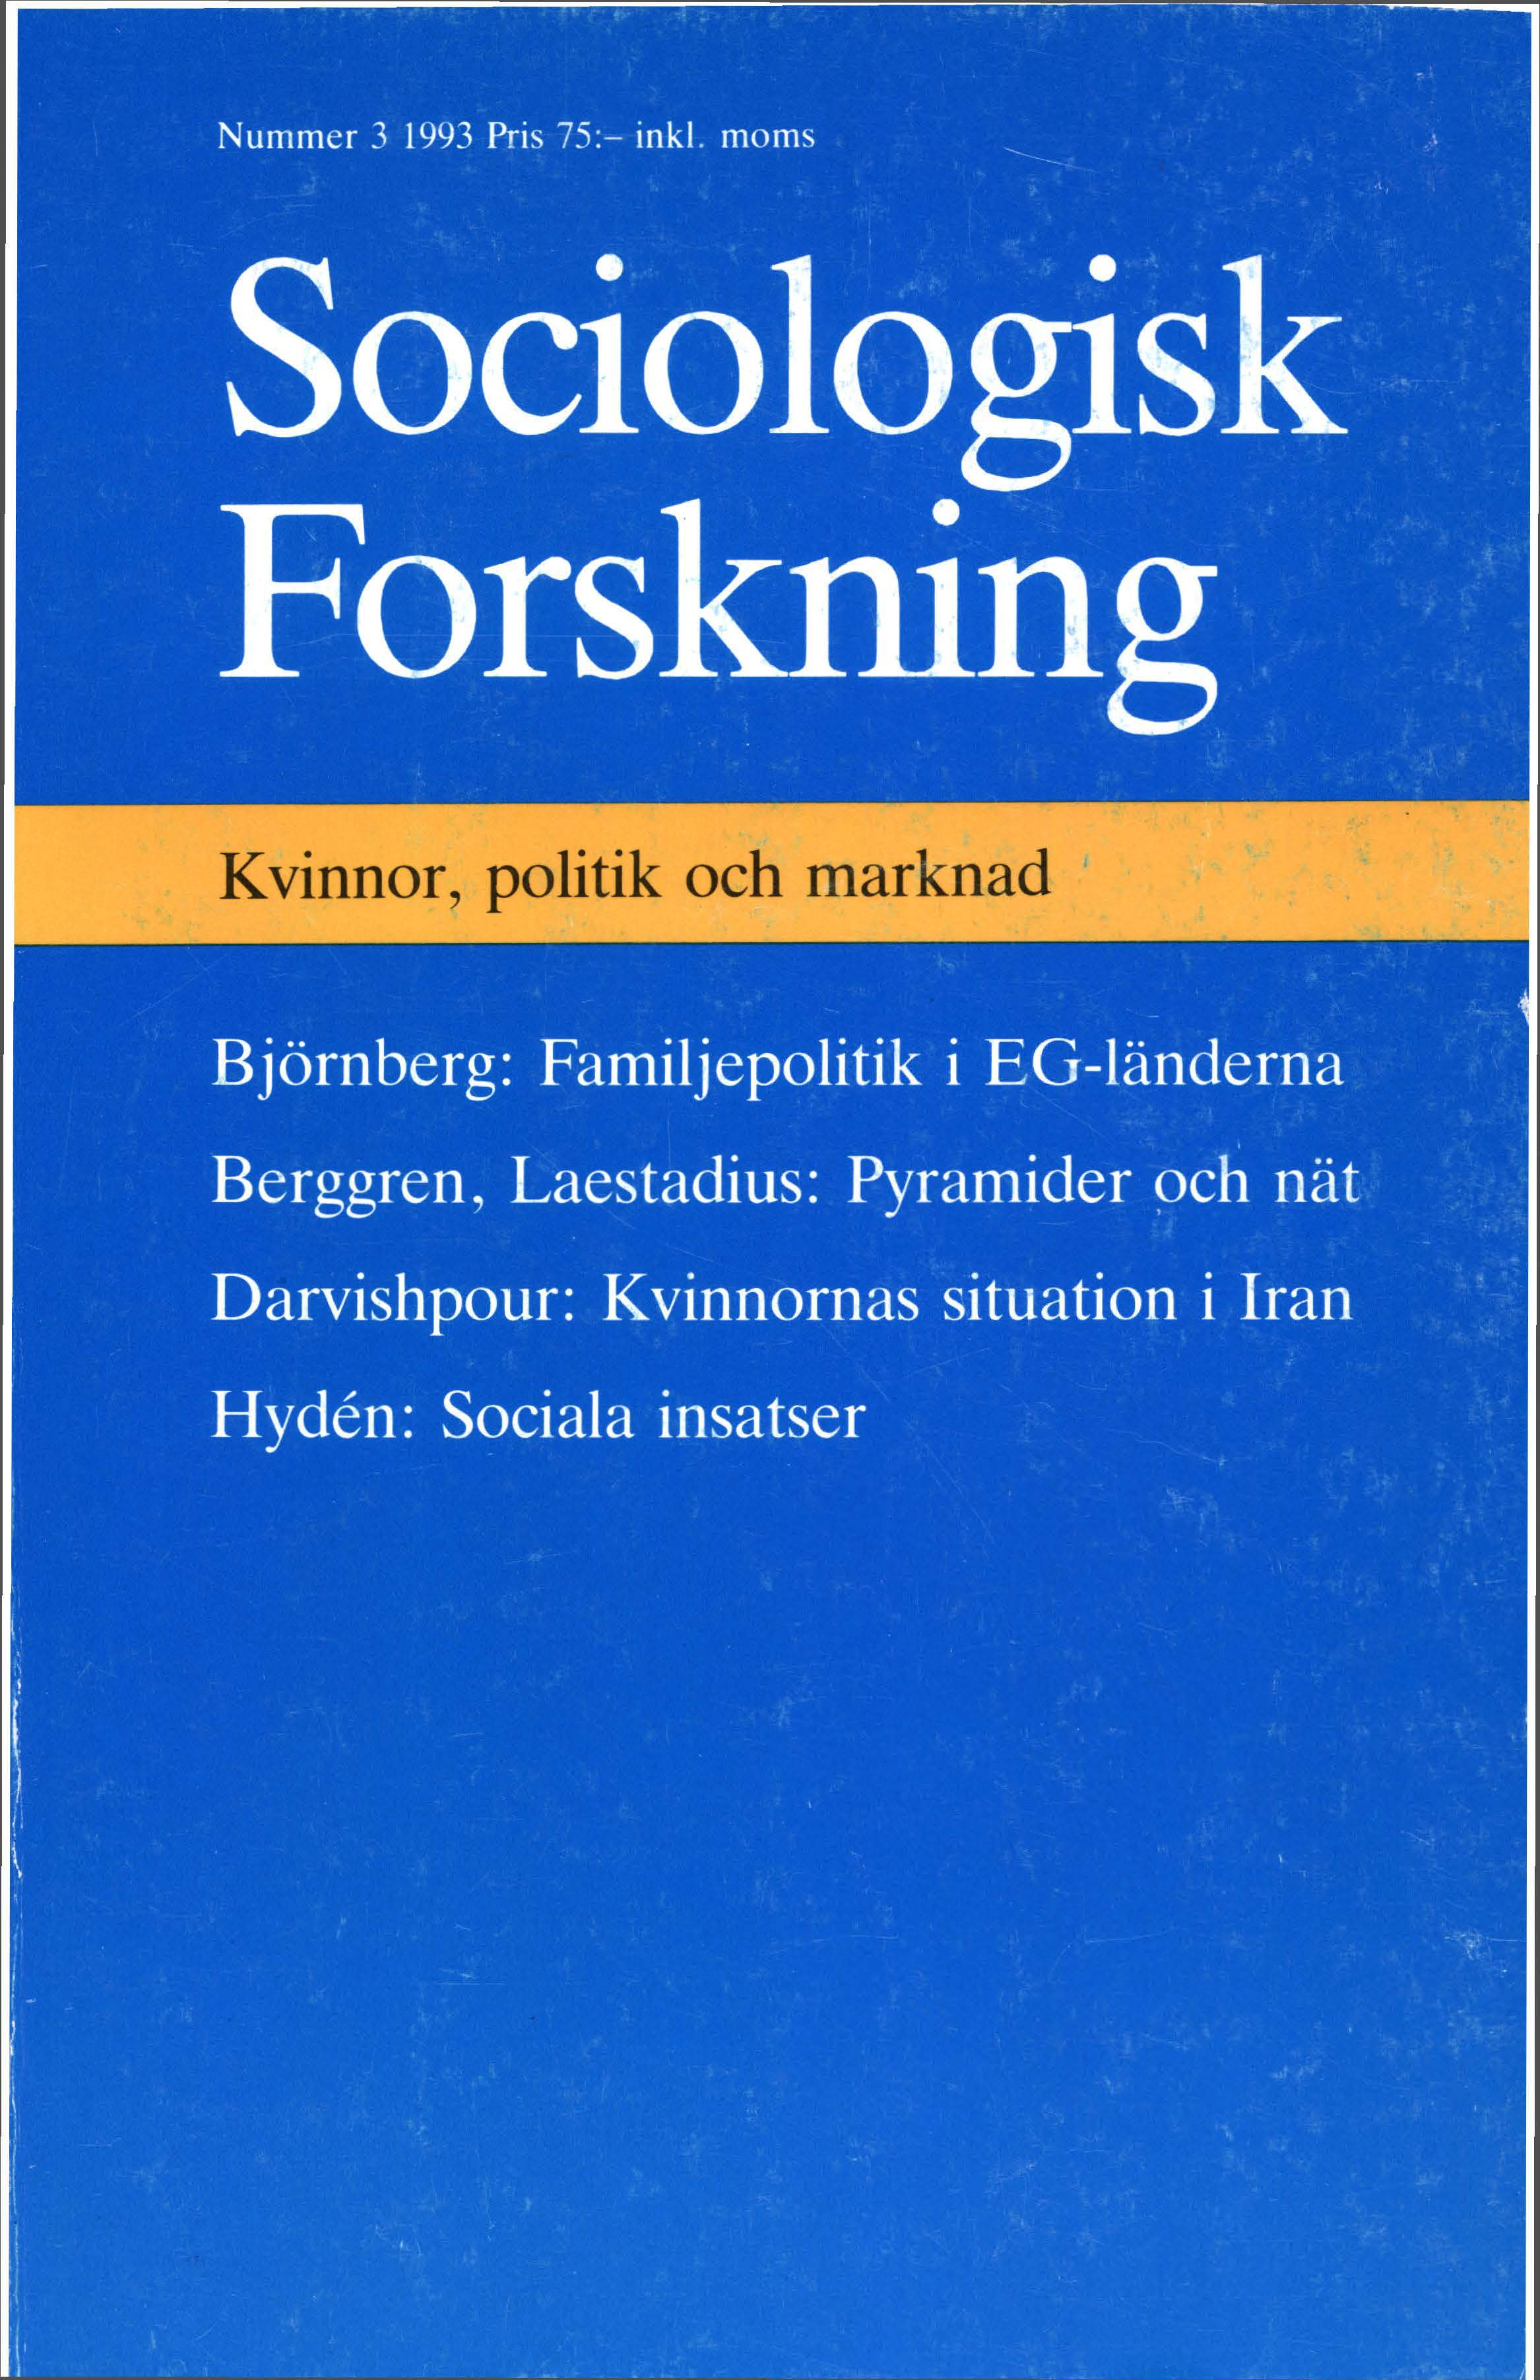 Visa Vol 30 Nr 3 (1993)